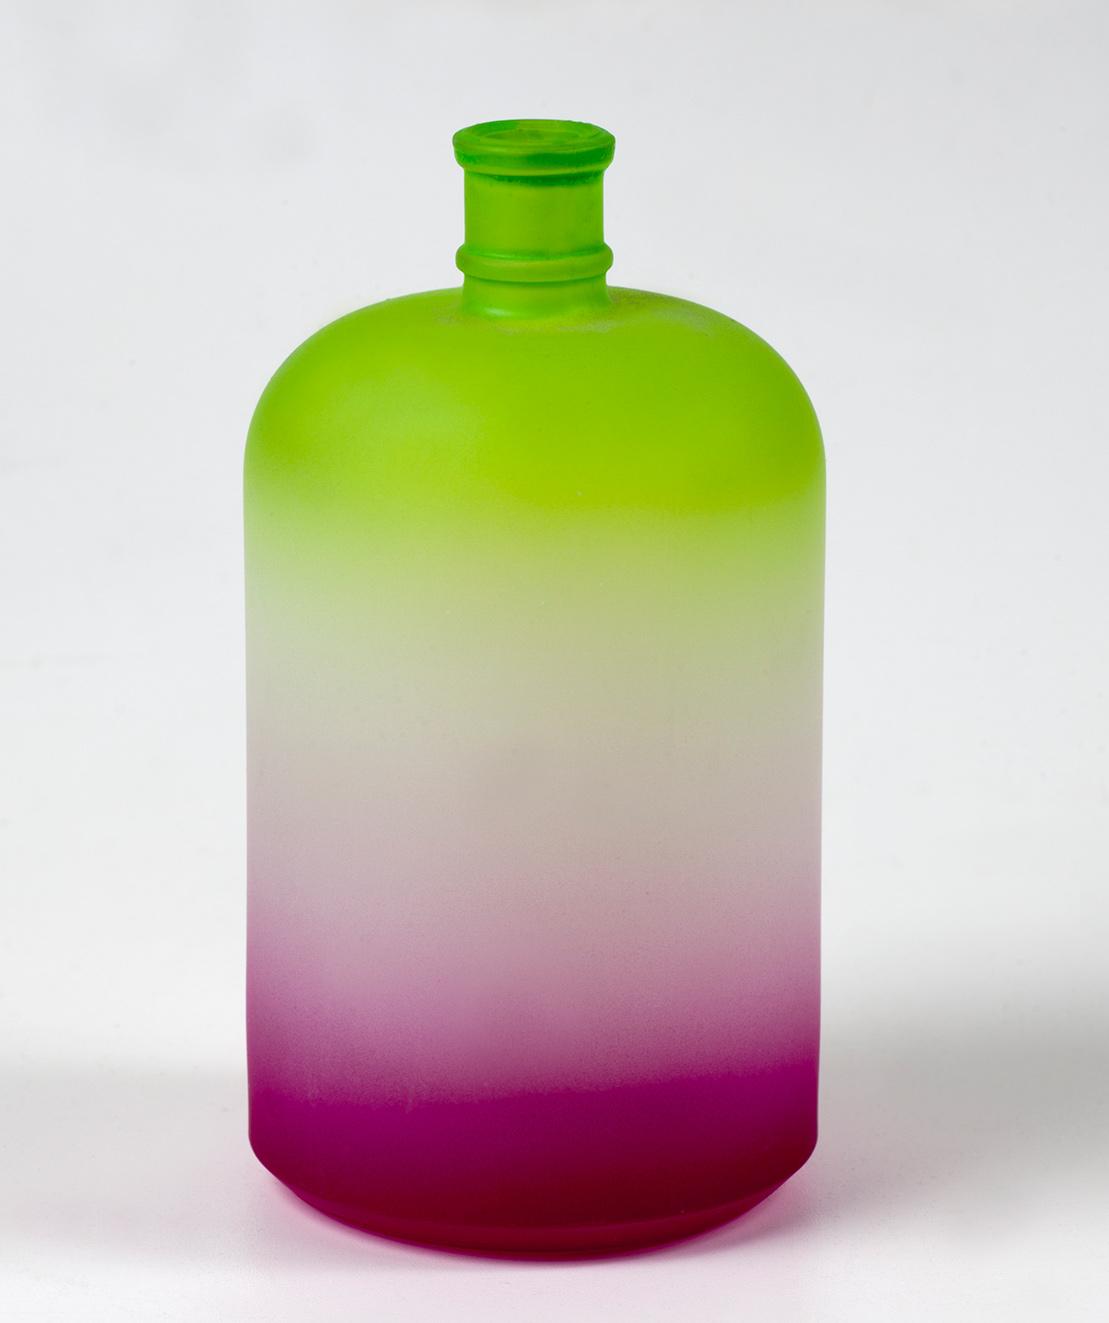 Diseño envase de cristal